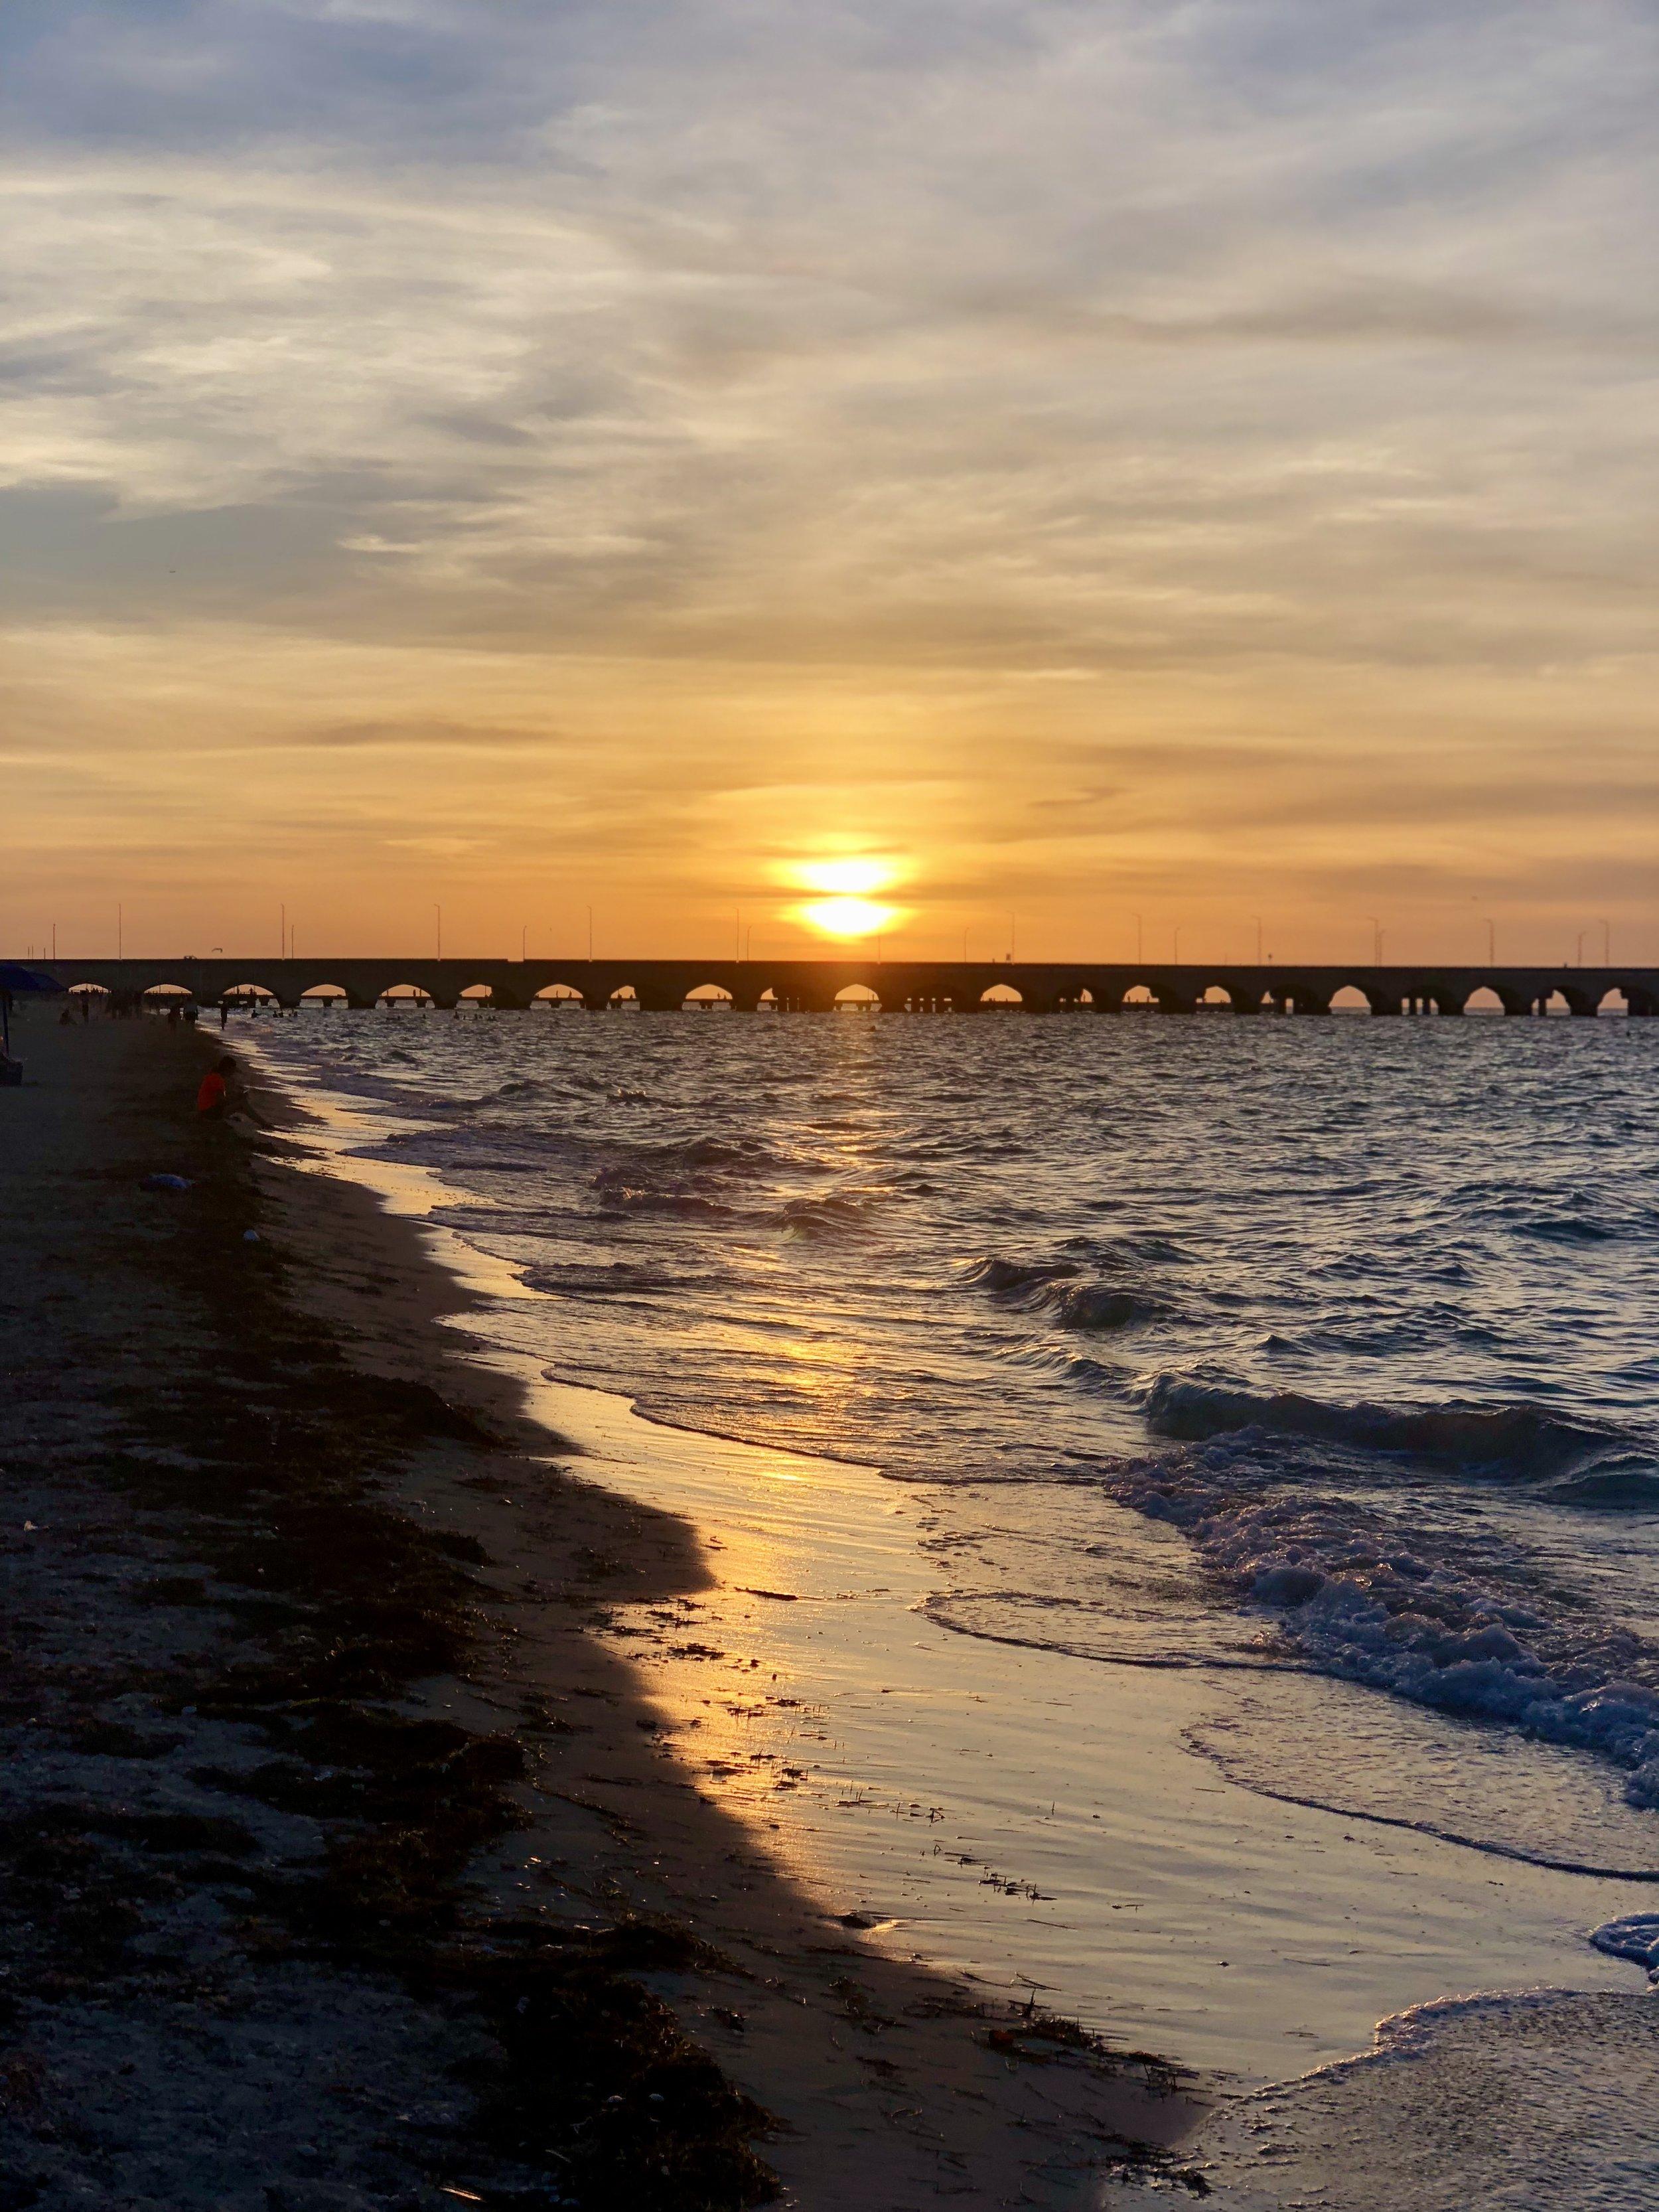 Sunset on Progresso beach near Mérida